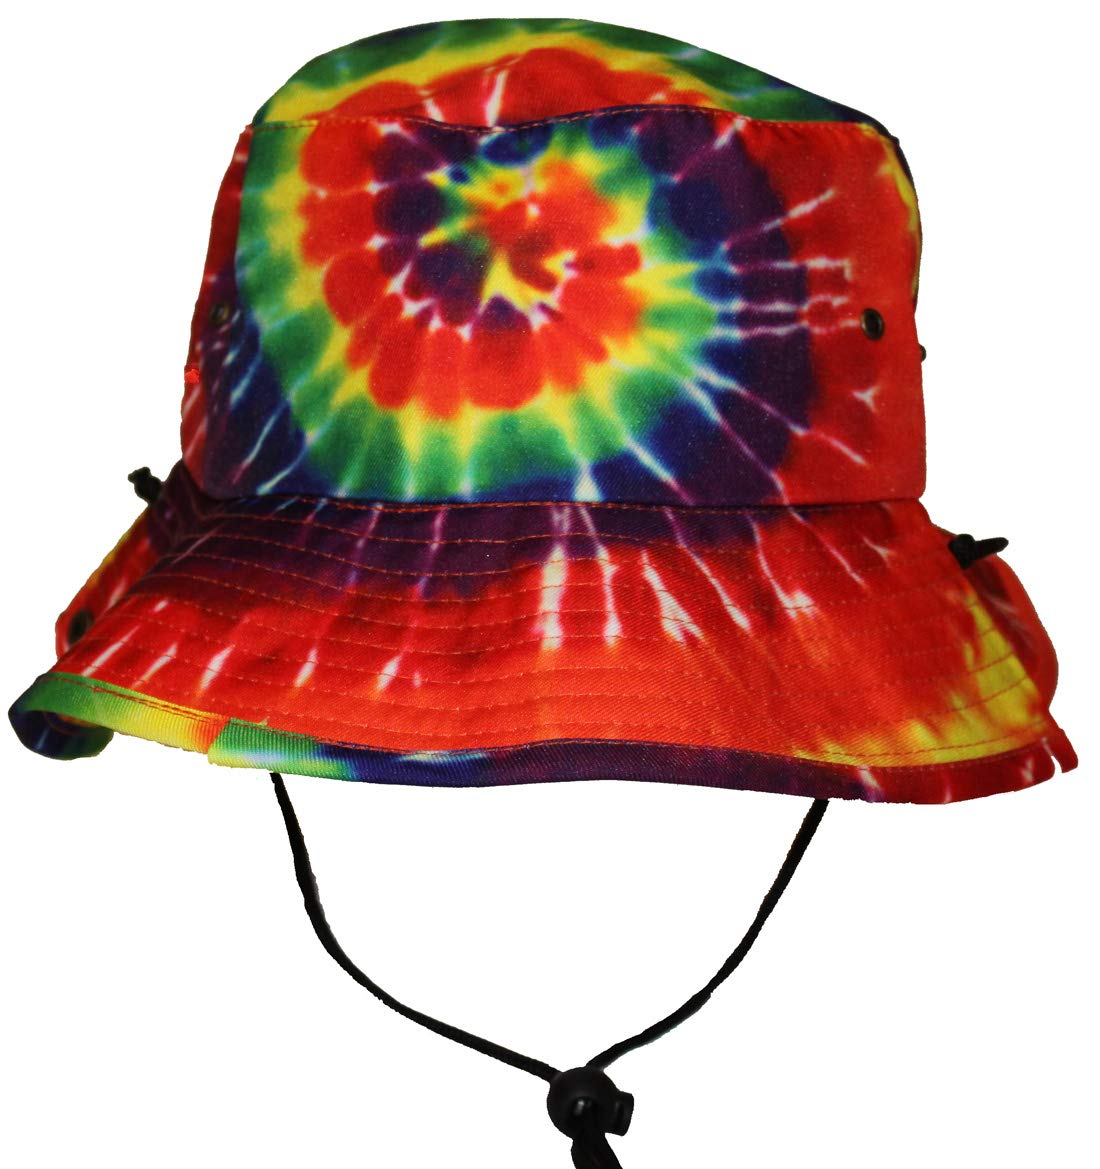 Amazon.com  Tie Dye Jungle Bucket Hat With String Strap for Men Women  Rainbow Colors  Sports   Outdoors d2c2dc7c2b2